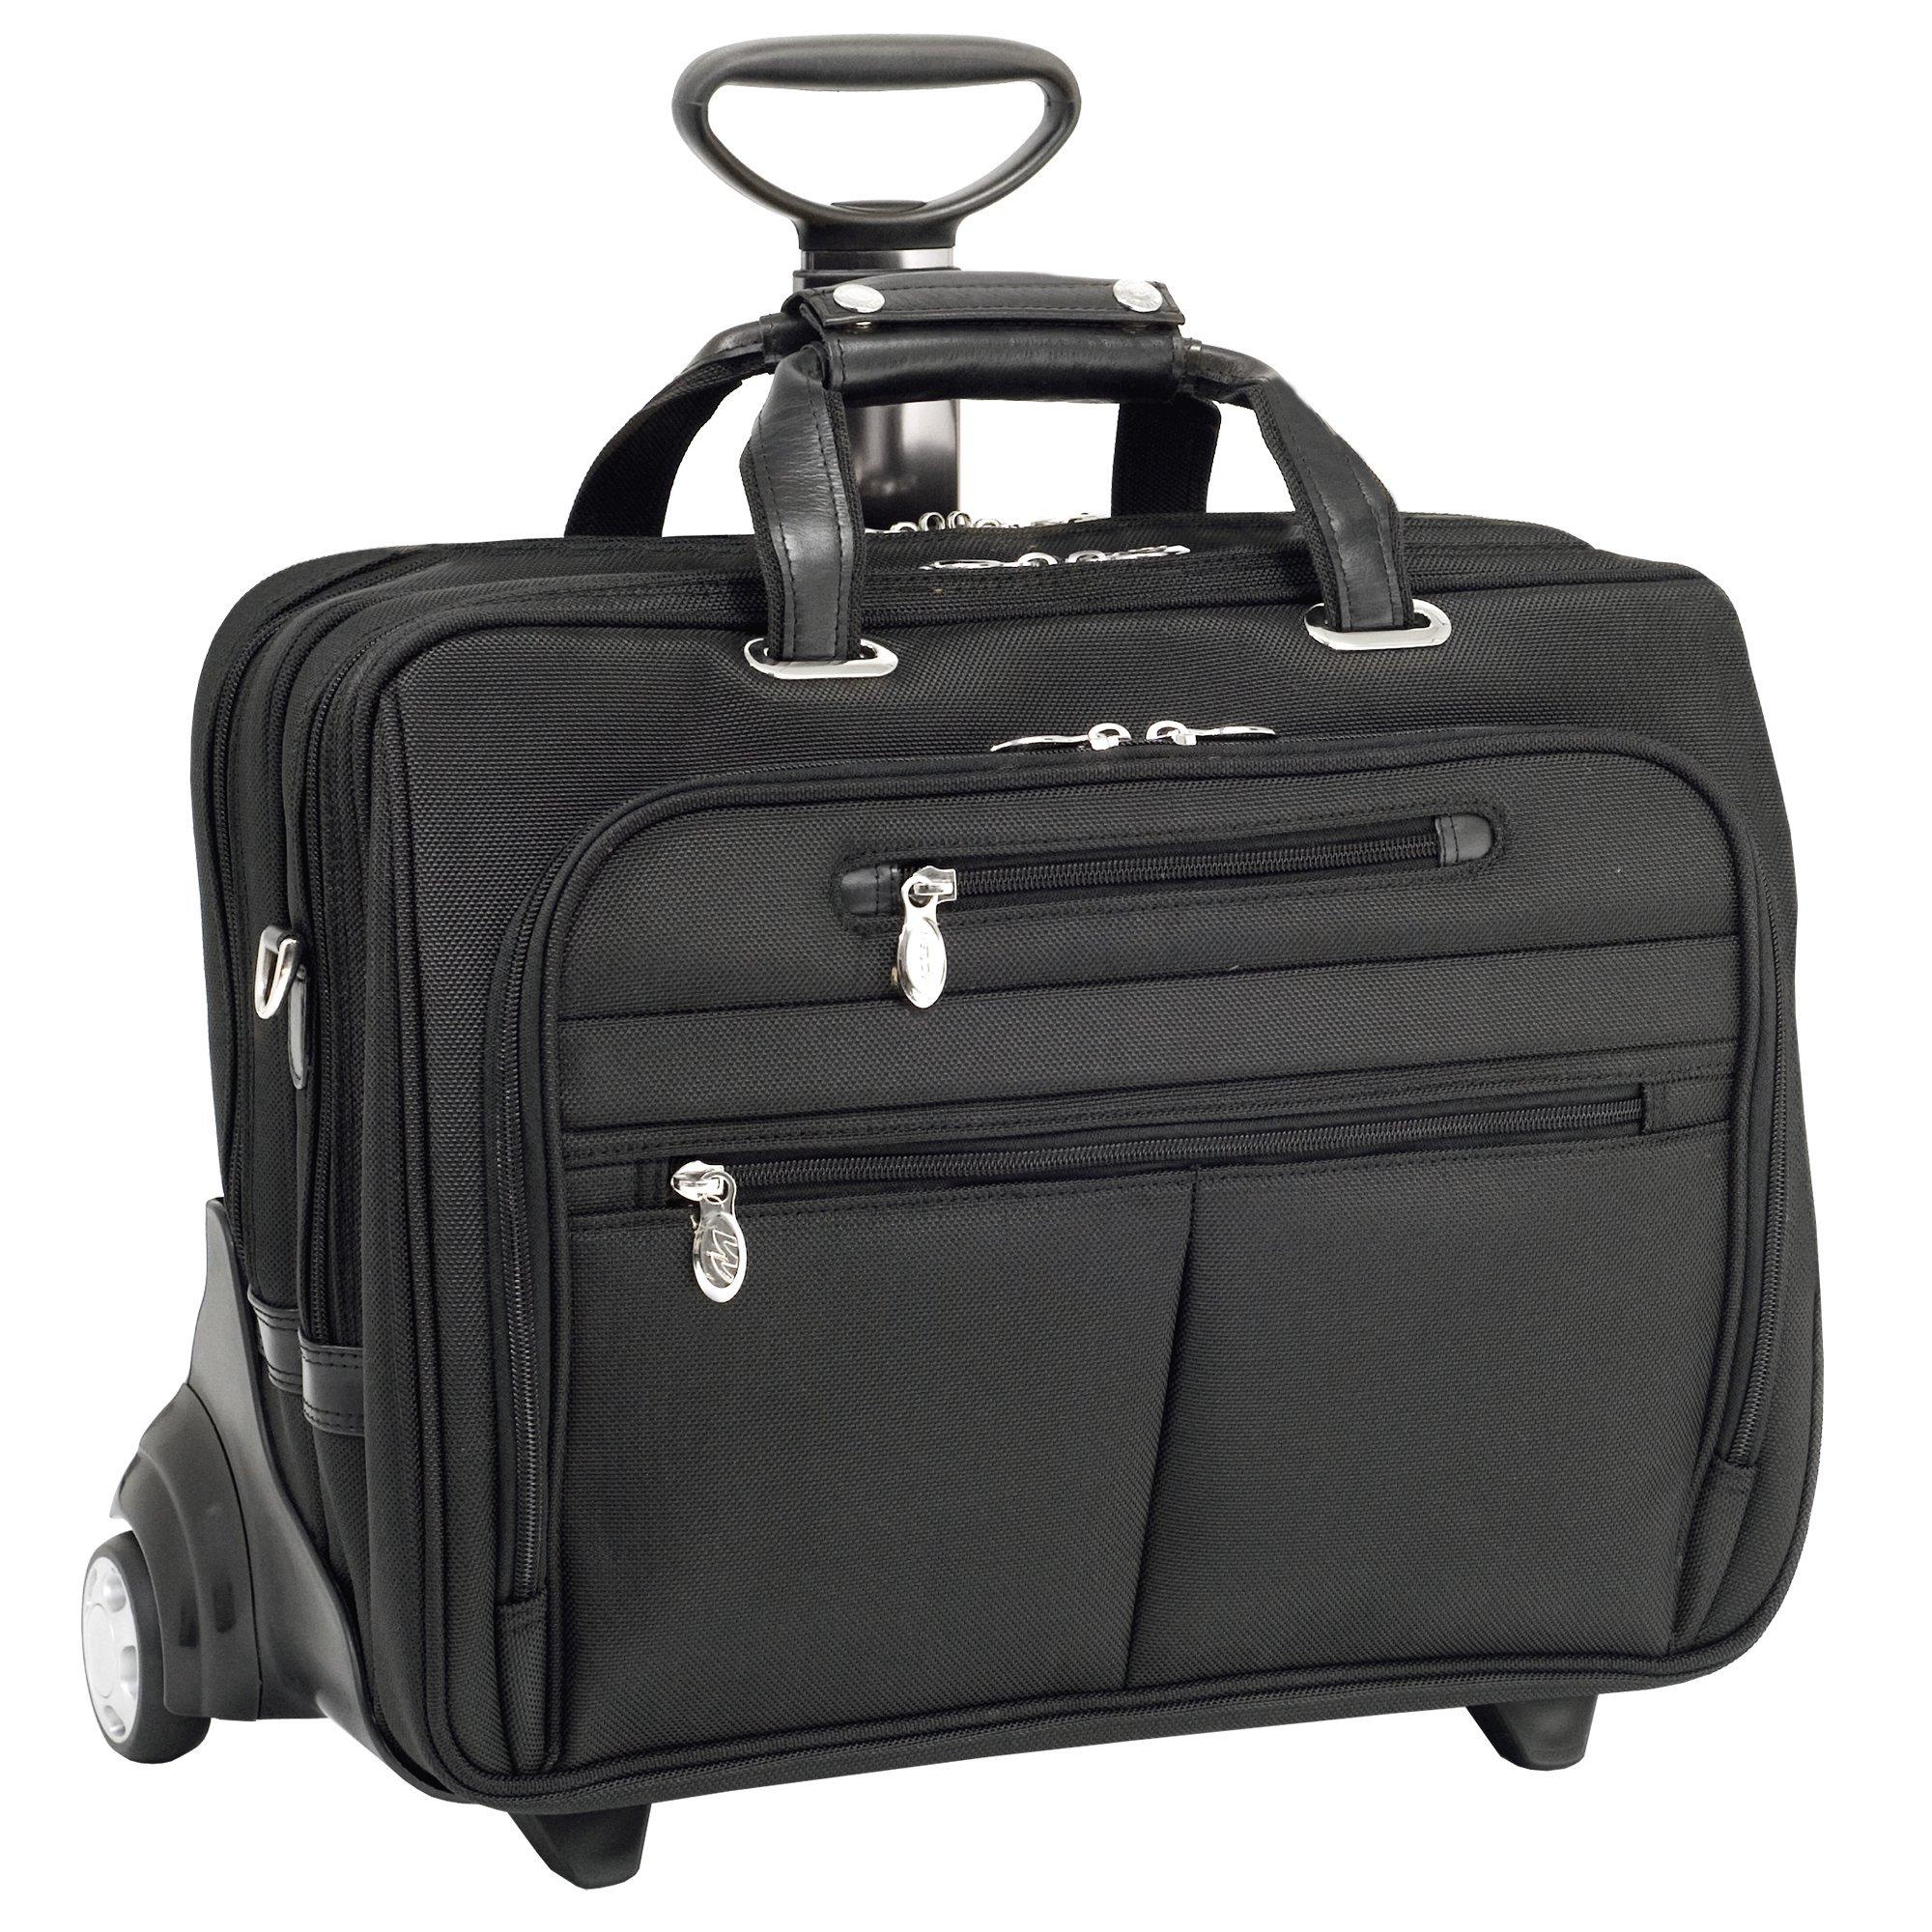 Mcklein USA 76535 Ohare, 15.6'' Nylon Checkpoint friendly Wheeled Laptop Briefcase, 18''x9.25''x14.5'', Black by McKleinUSA